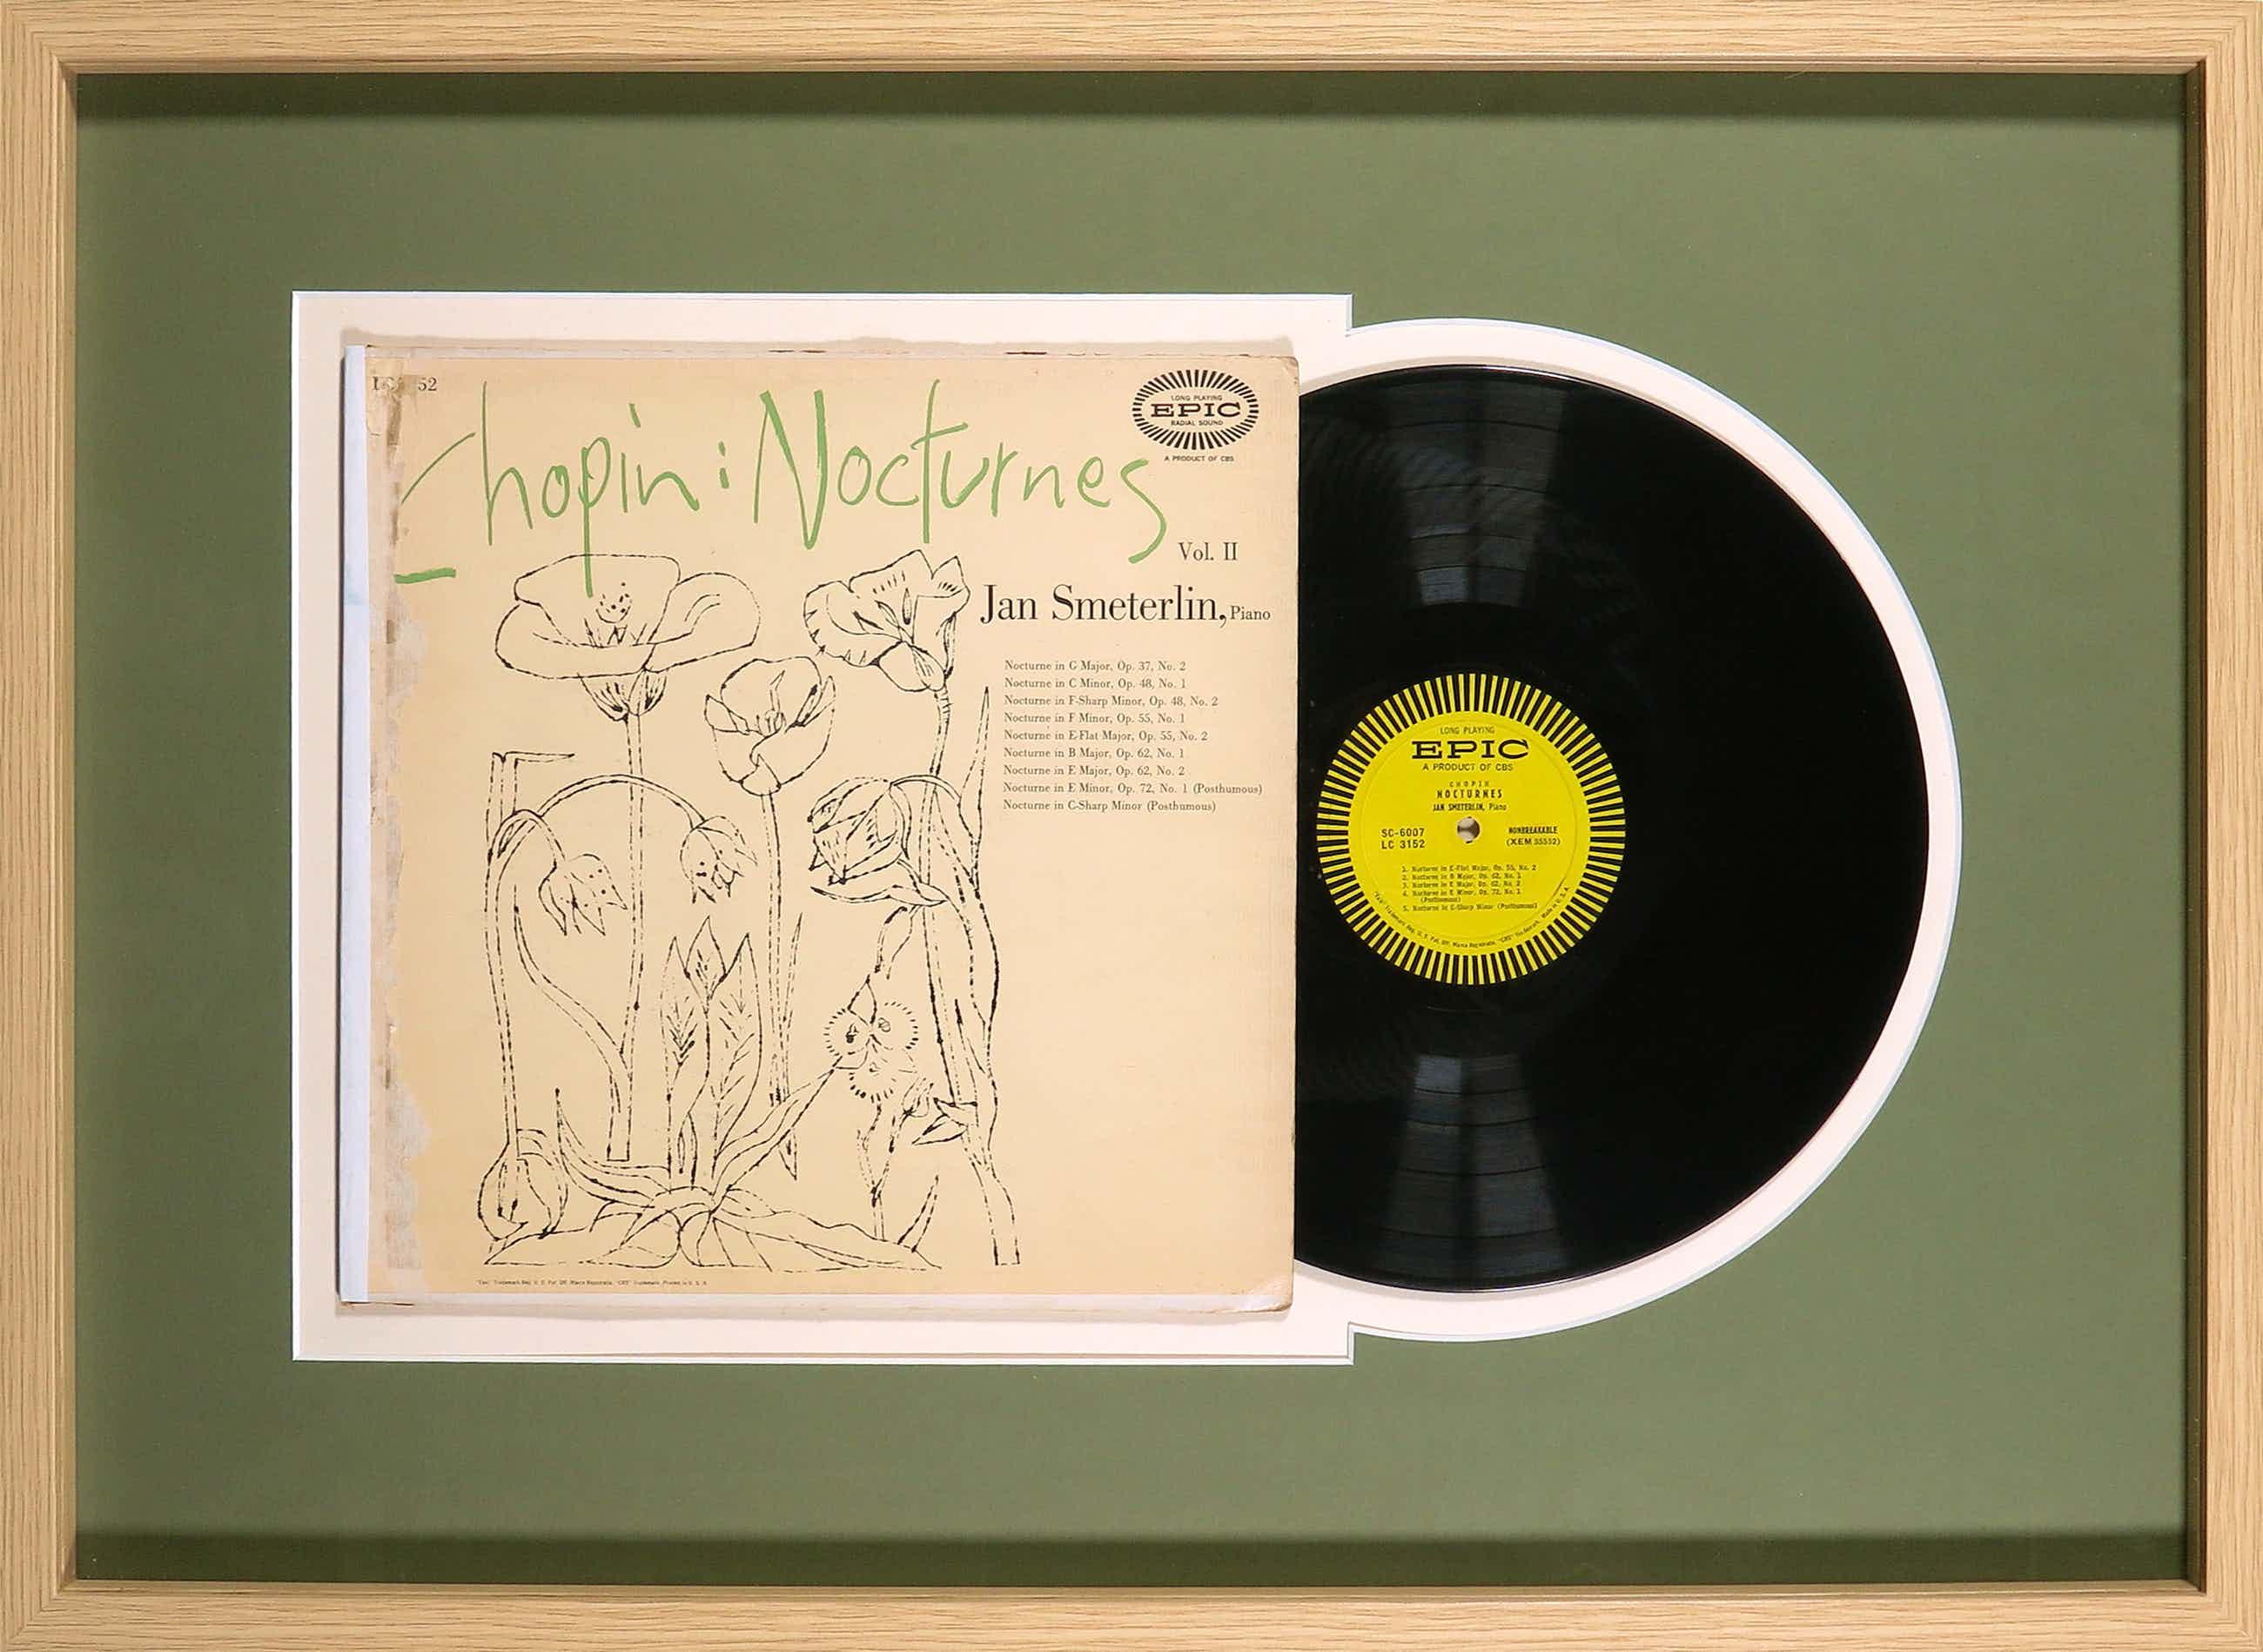 Andy Warhol - Chopin - Jan Smeterlin – Nocturnes Vol. I - Ingelijst kopen? Bied vanaf 75!